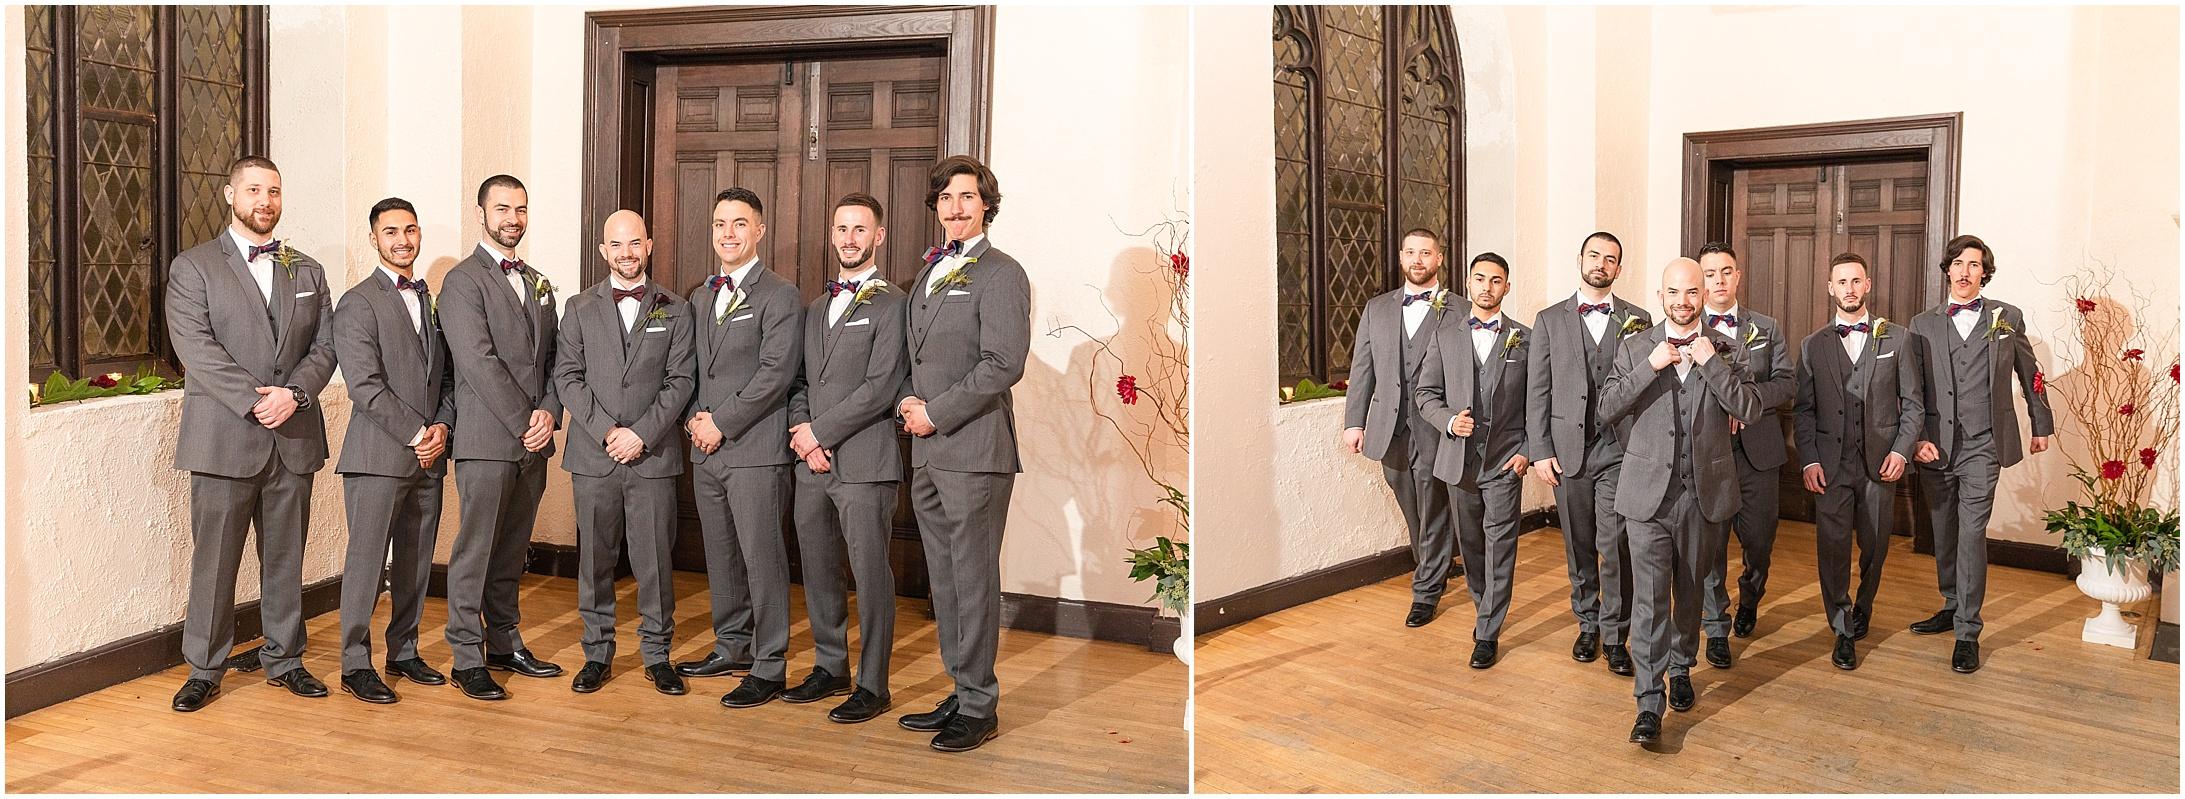 Baltimore-Wedding-Photographer_0172.jpg